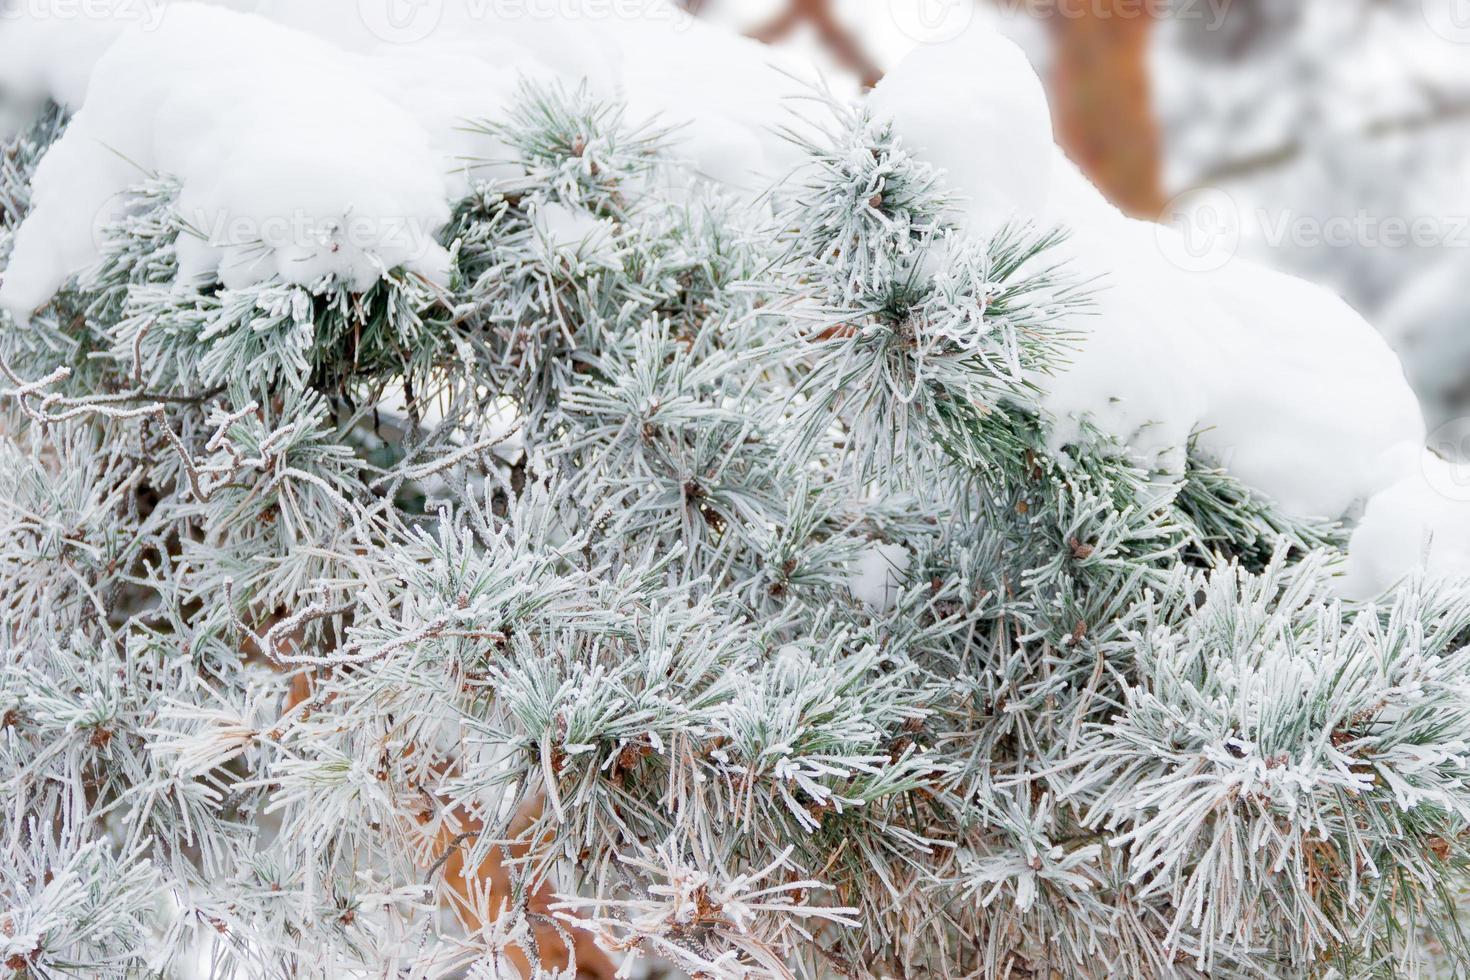 Rama de pino cubierto de escarcha closeup foto